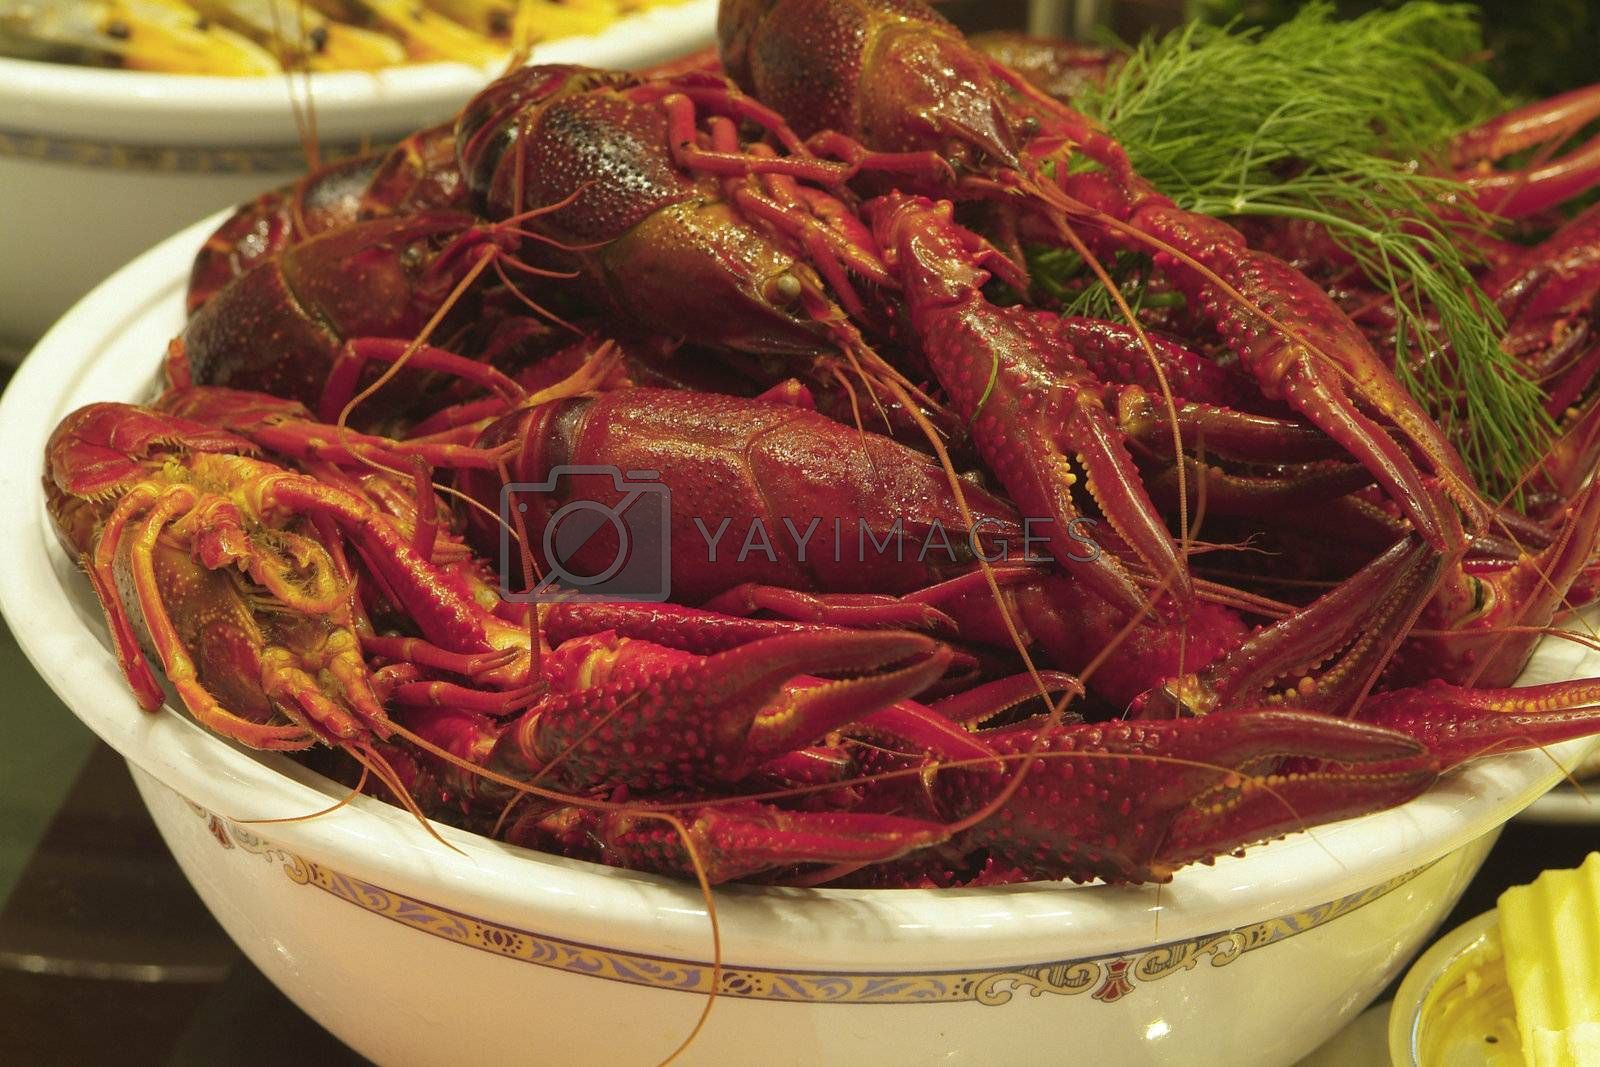 Bowl of crayfish by epixx